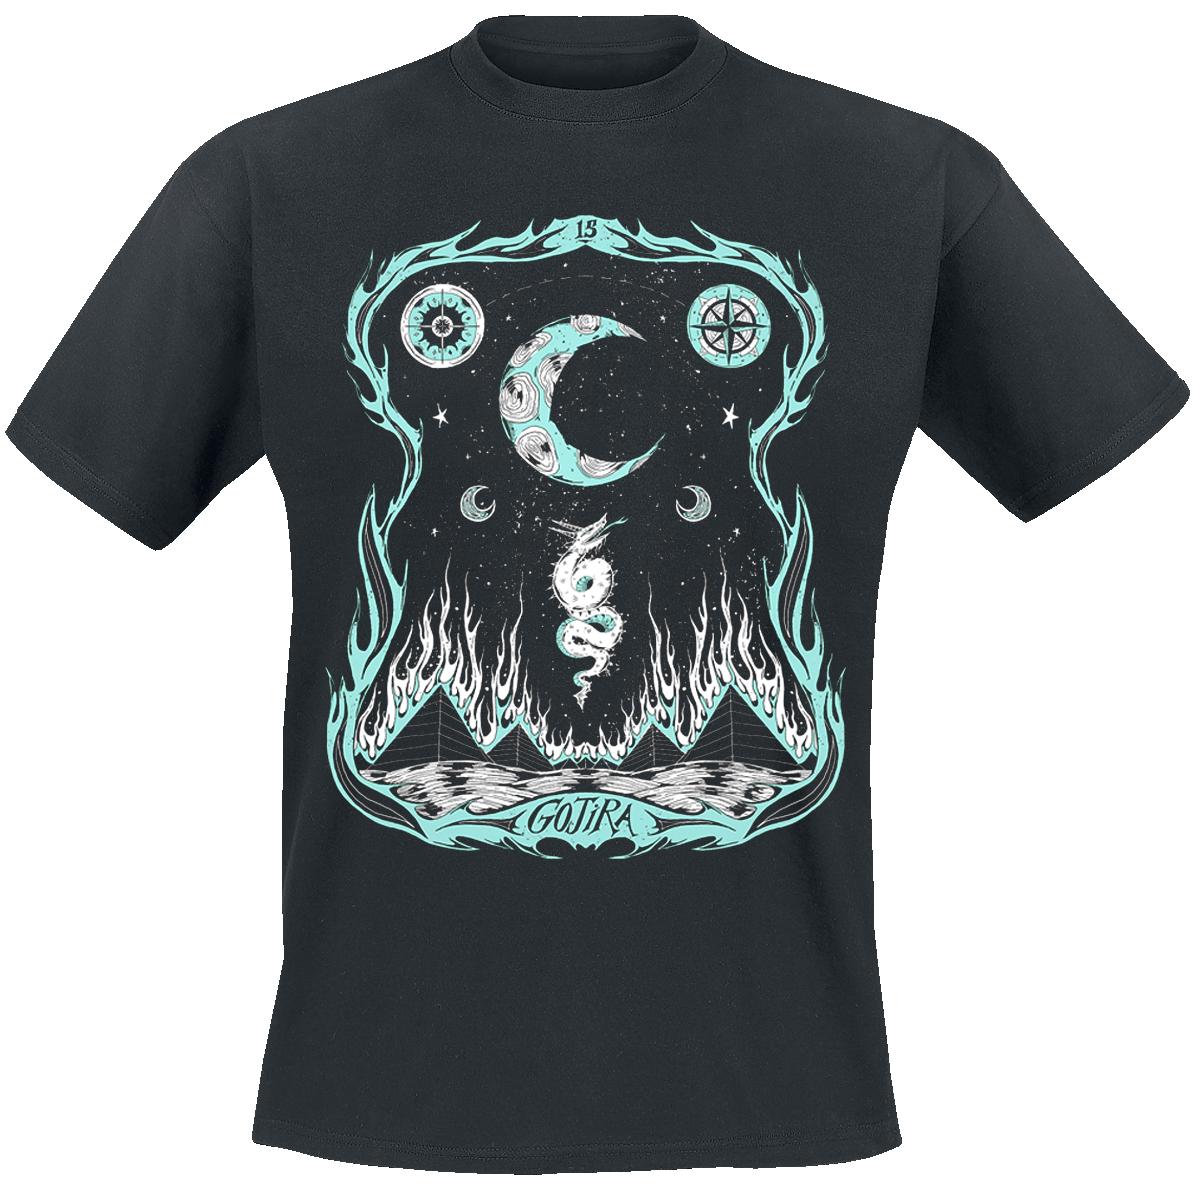 Gojira - Dragons Dwell - T-Shirt - schwarz